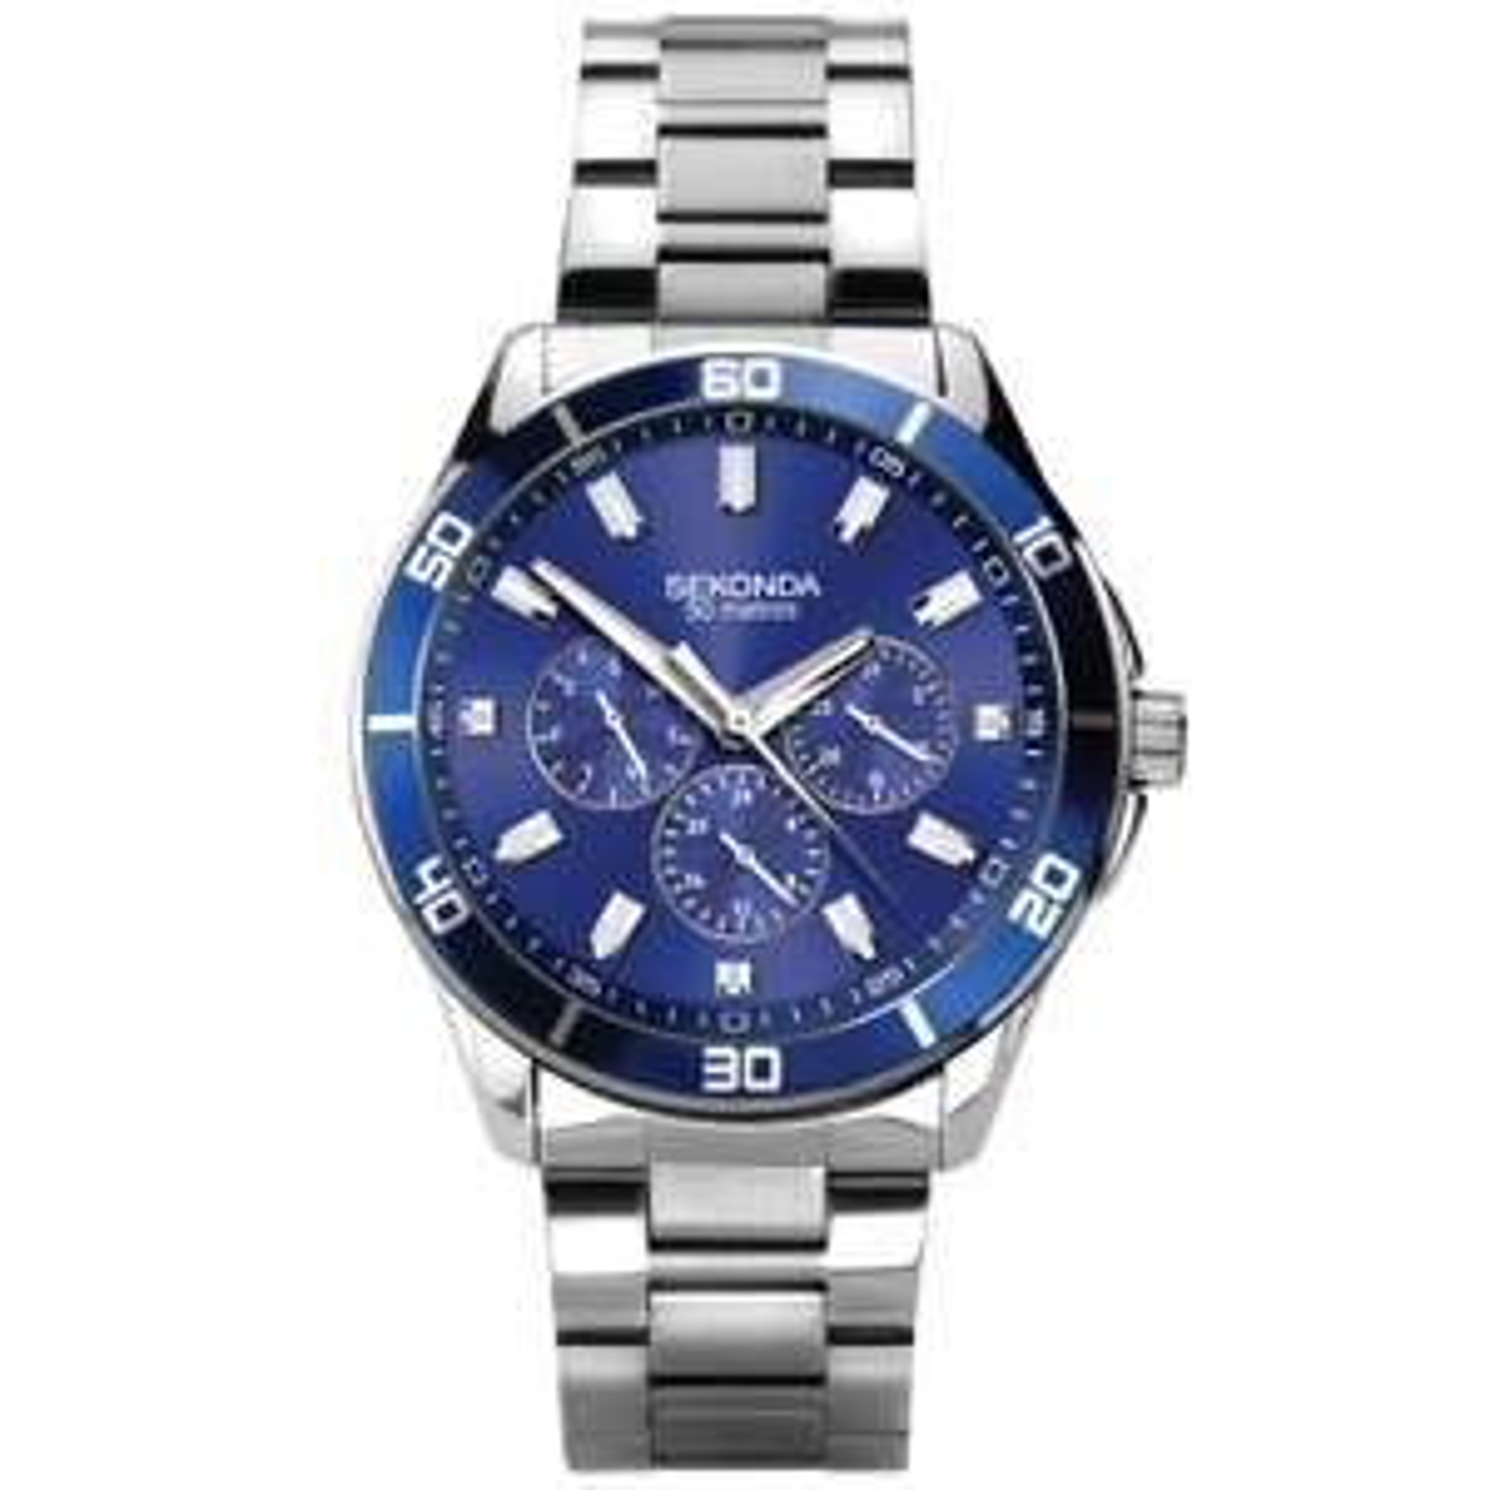 Sekonda Men's Stainless Steel Bracelet Watch, £29.74 with code at H.Samuel